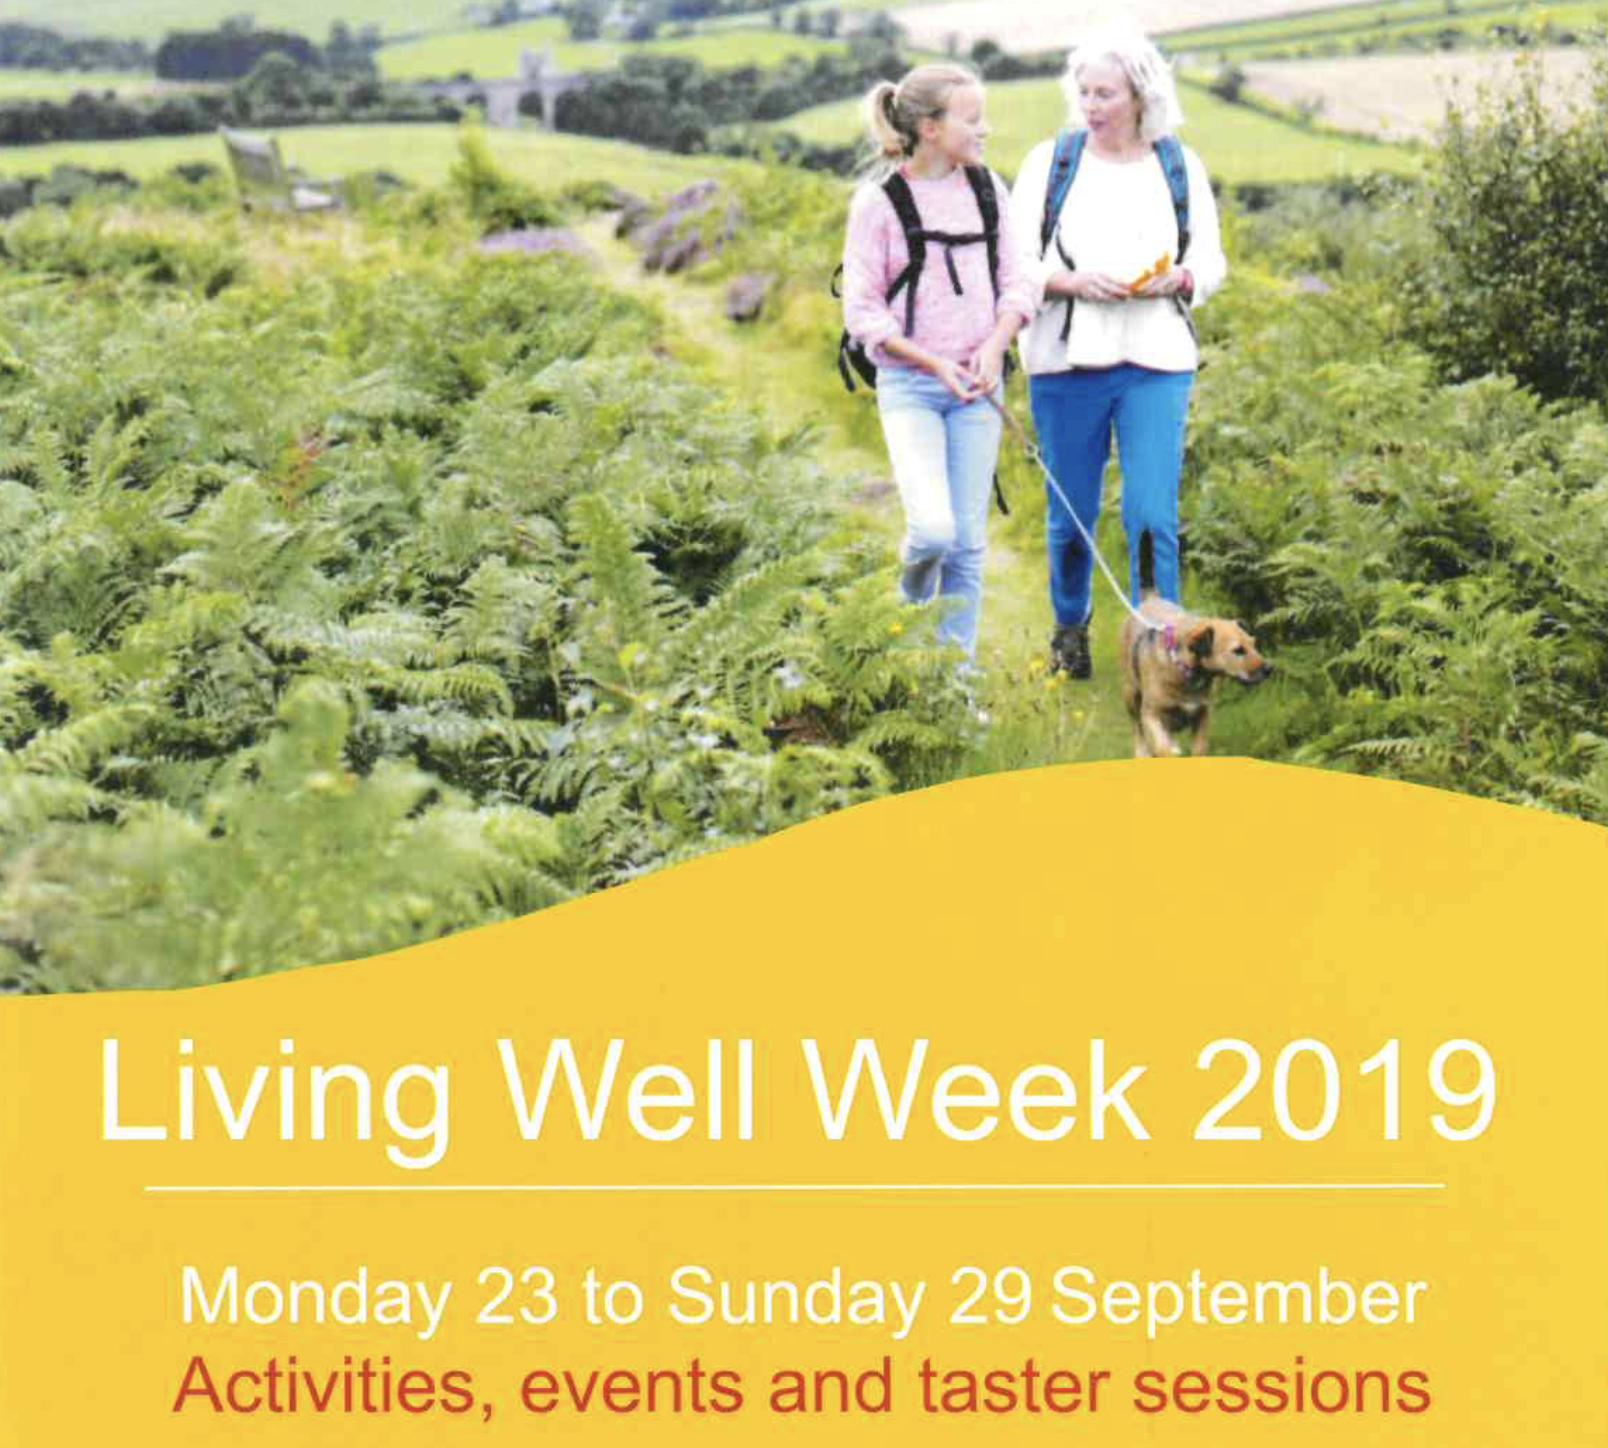 Living Well Week in Addlestone